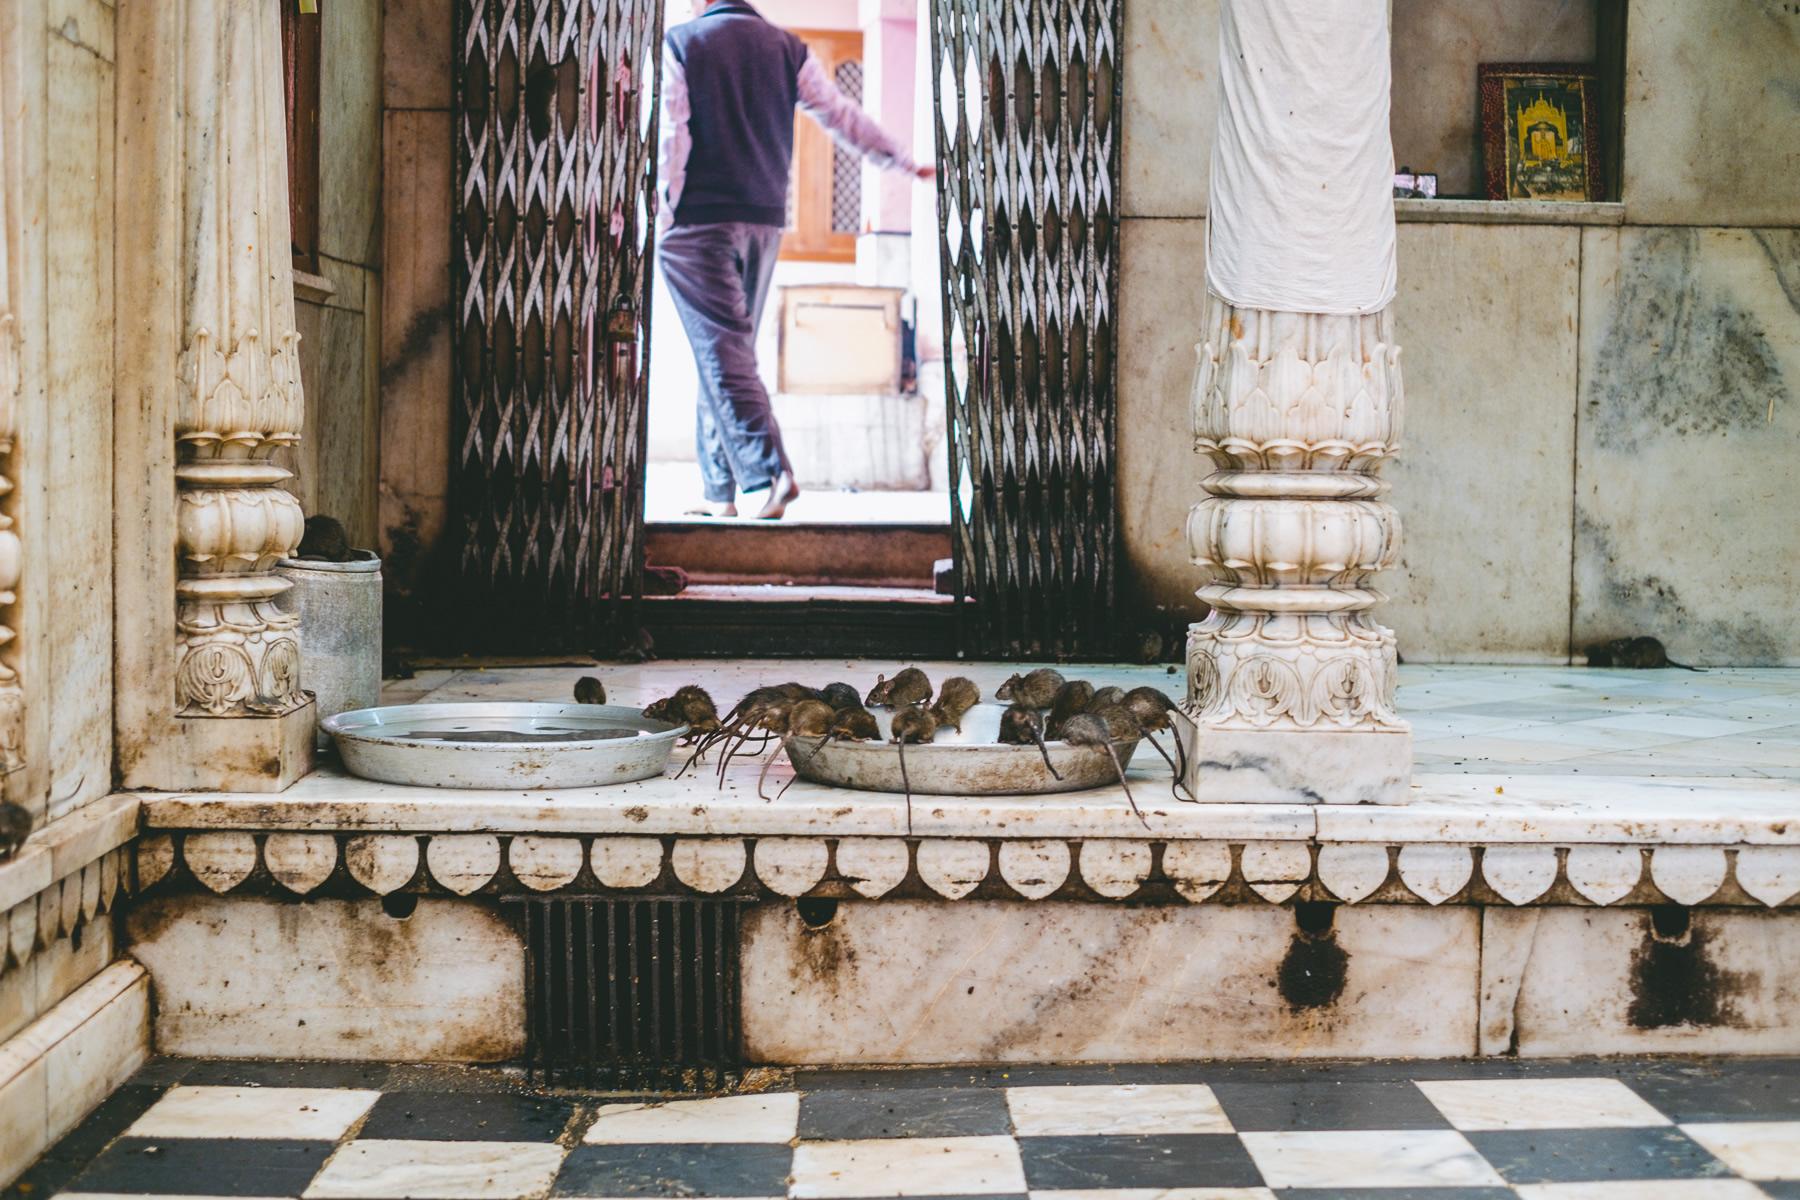 Karni Mata, Hindu Temple, Deshnoke, Rajasthan, India, Nathan Brayshaw